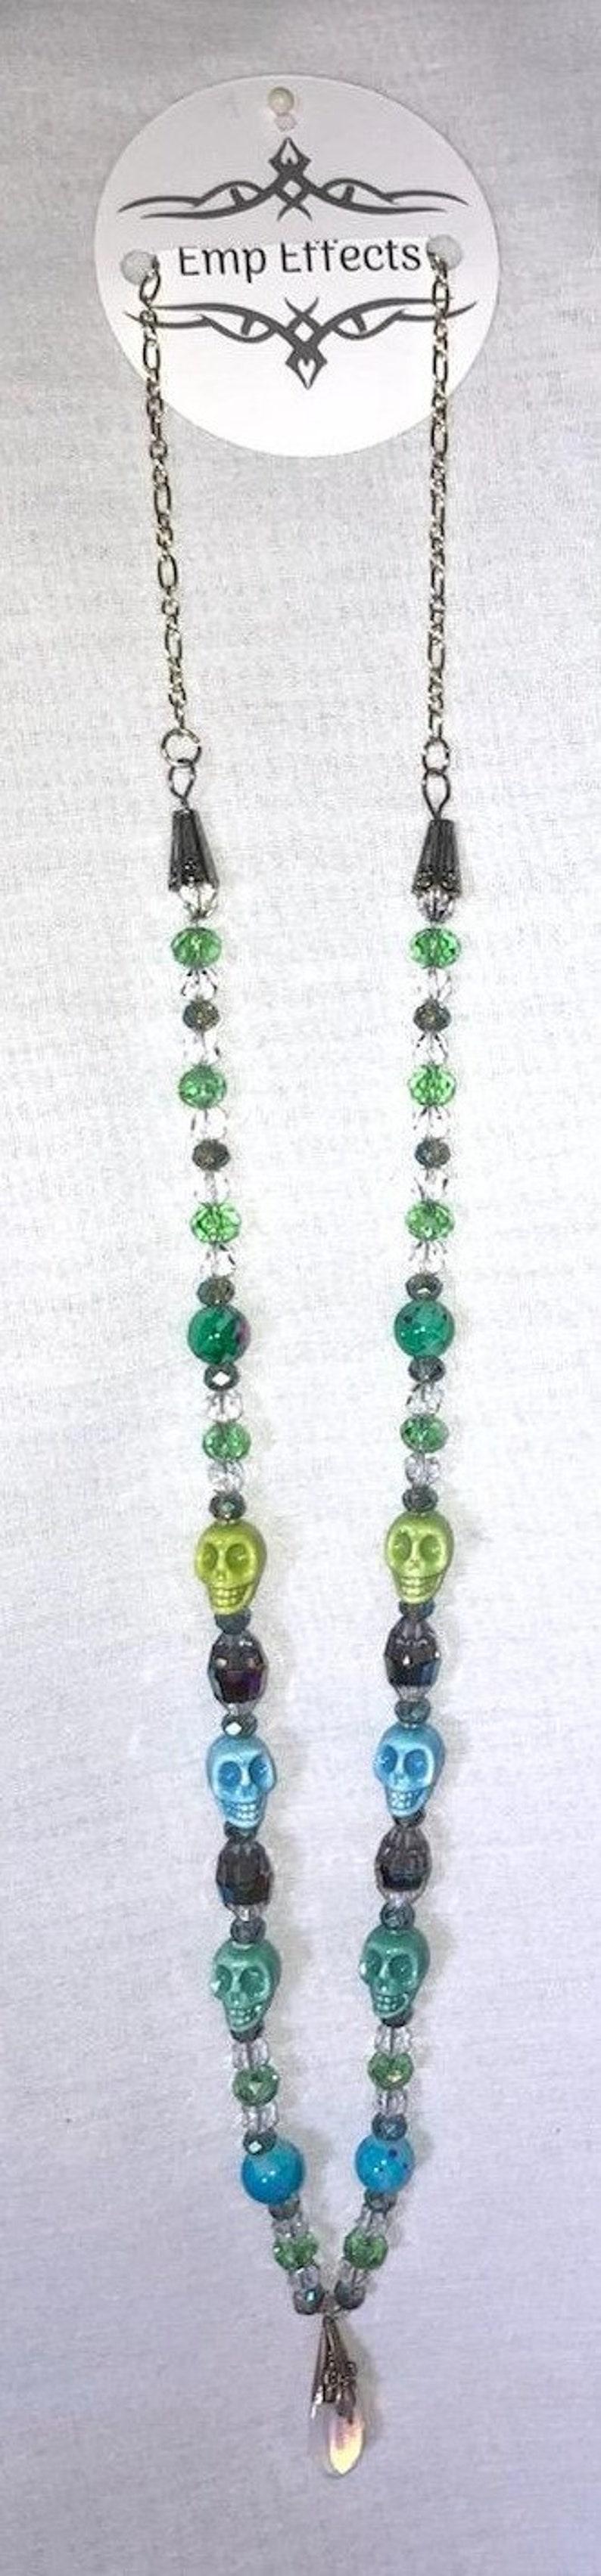 Porcelain Skull Necklace and Earring Set